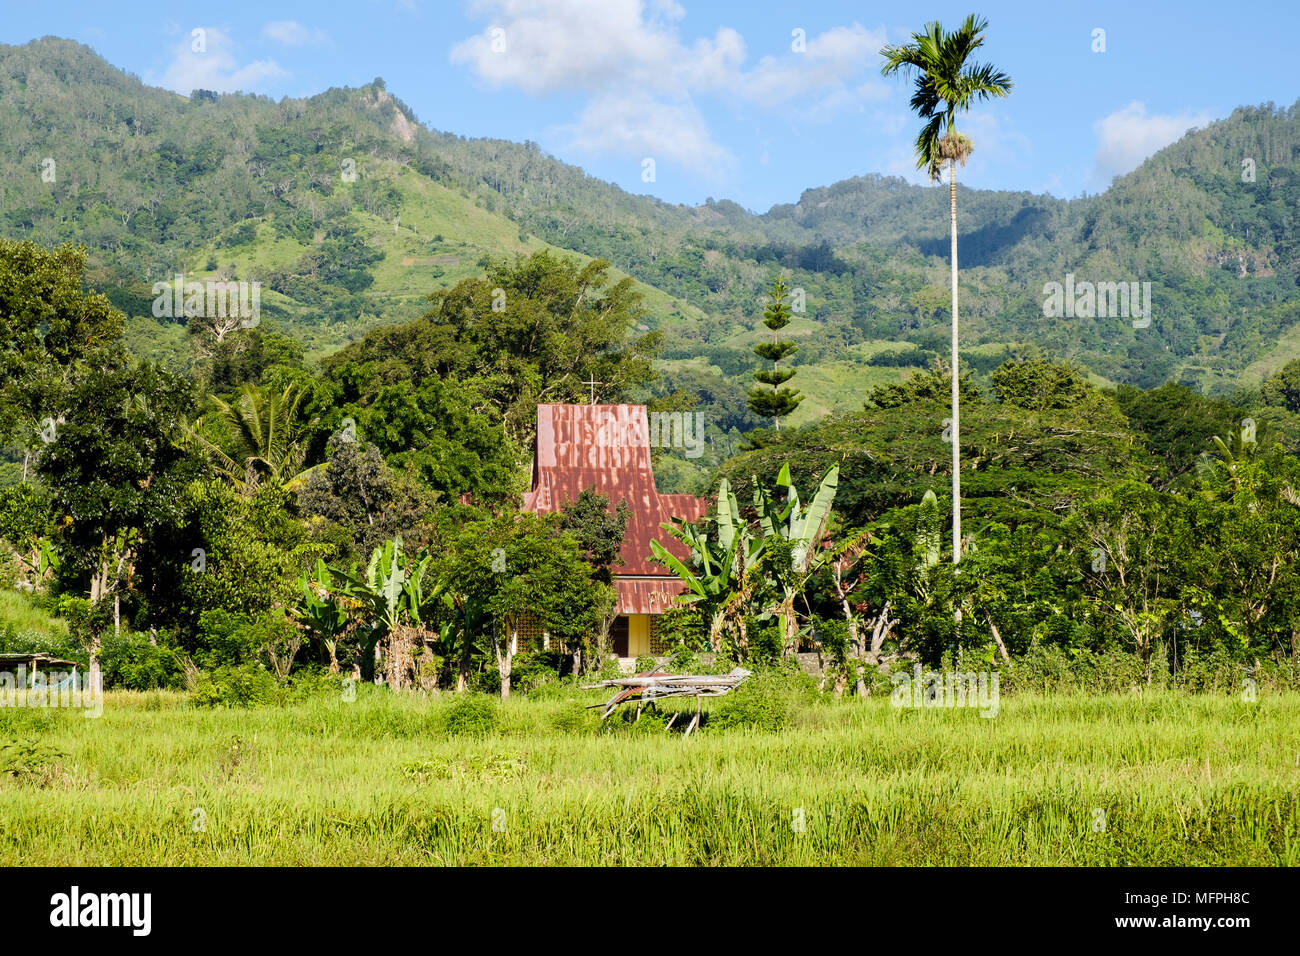 The Catholic church in the small village of Moni near Mount Kelimutu, Ende Regency, Flores Island, Indonesia. - Stock Image